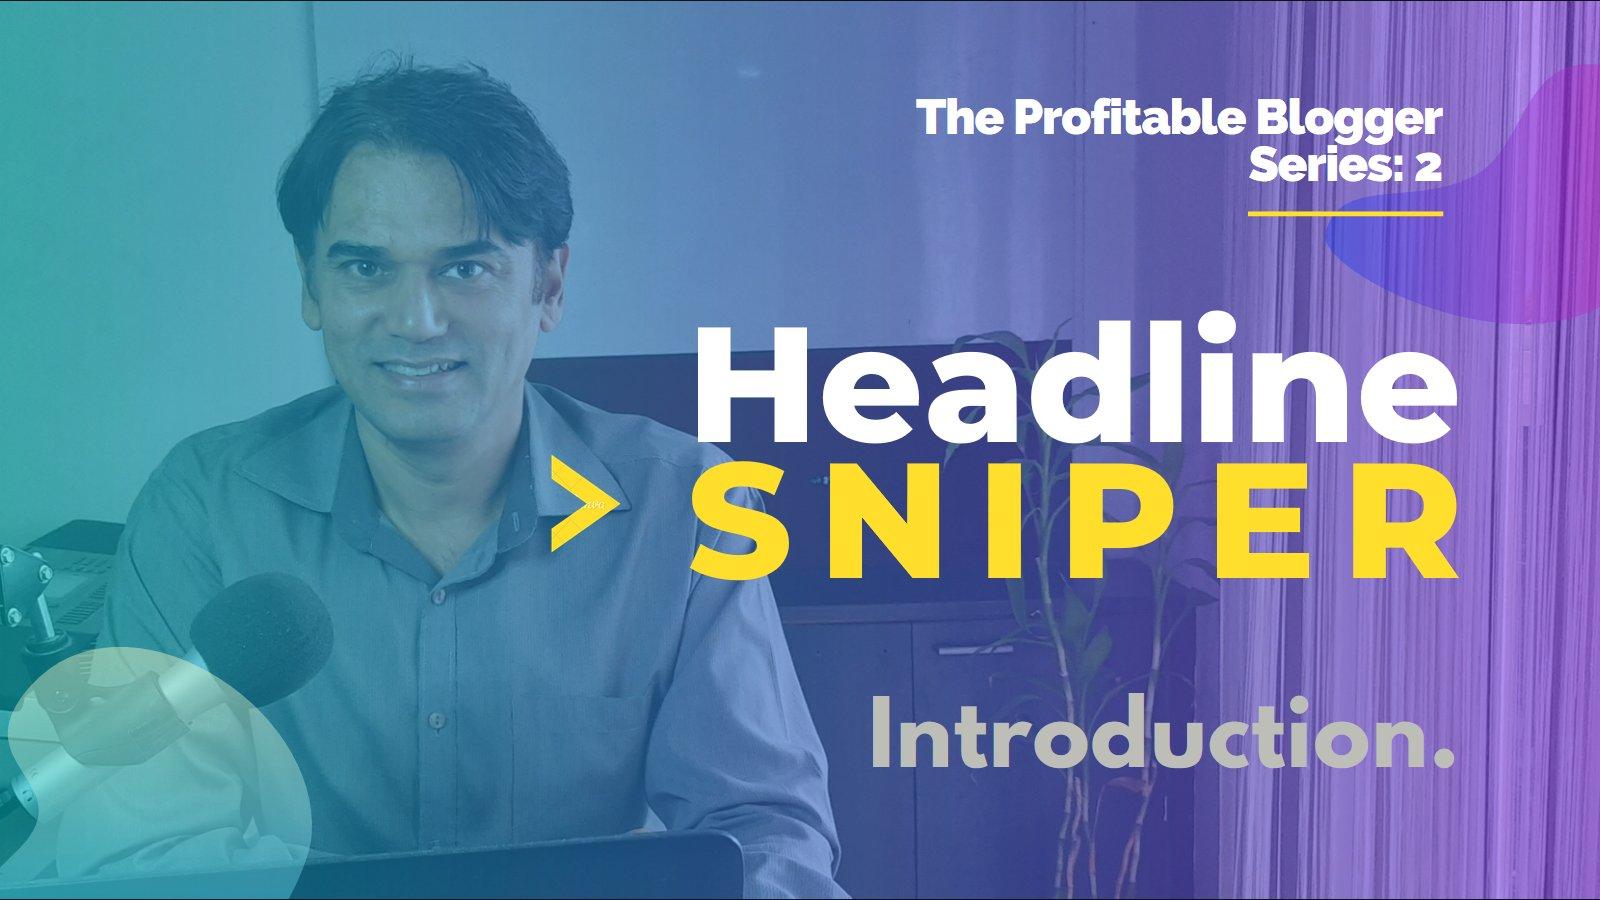 [The Profitable Blogger #2] Headline Sniper: Learn to craft converting headlines